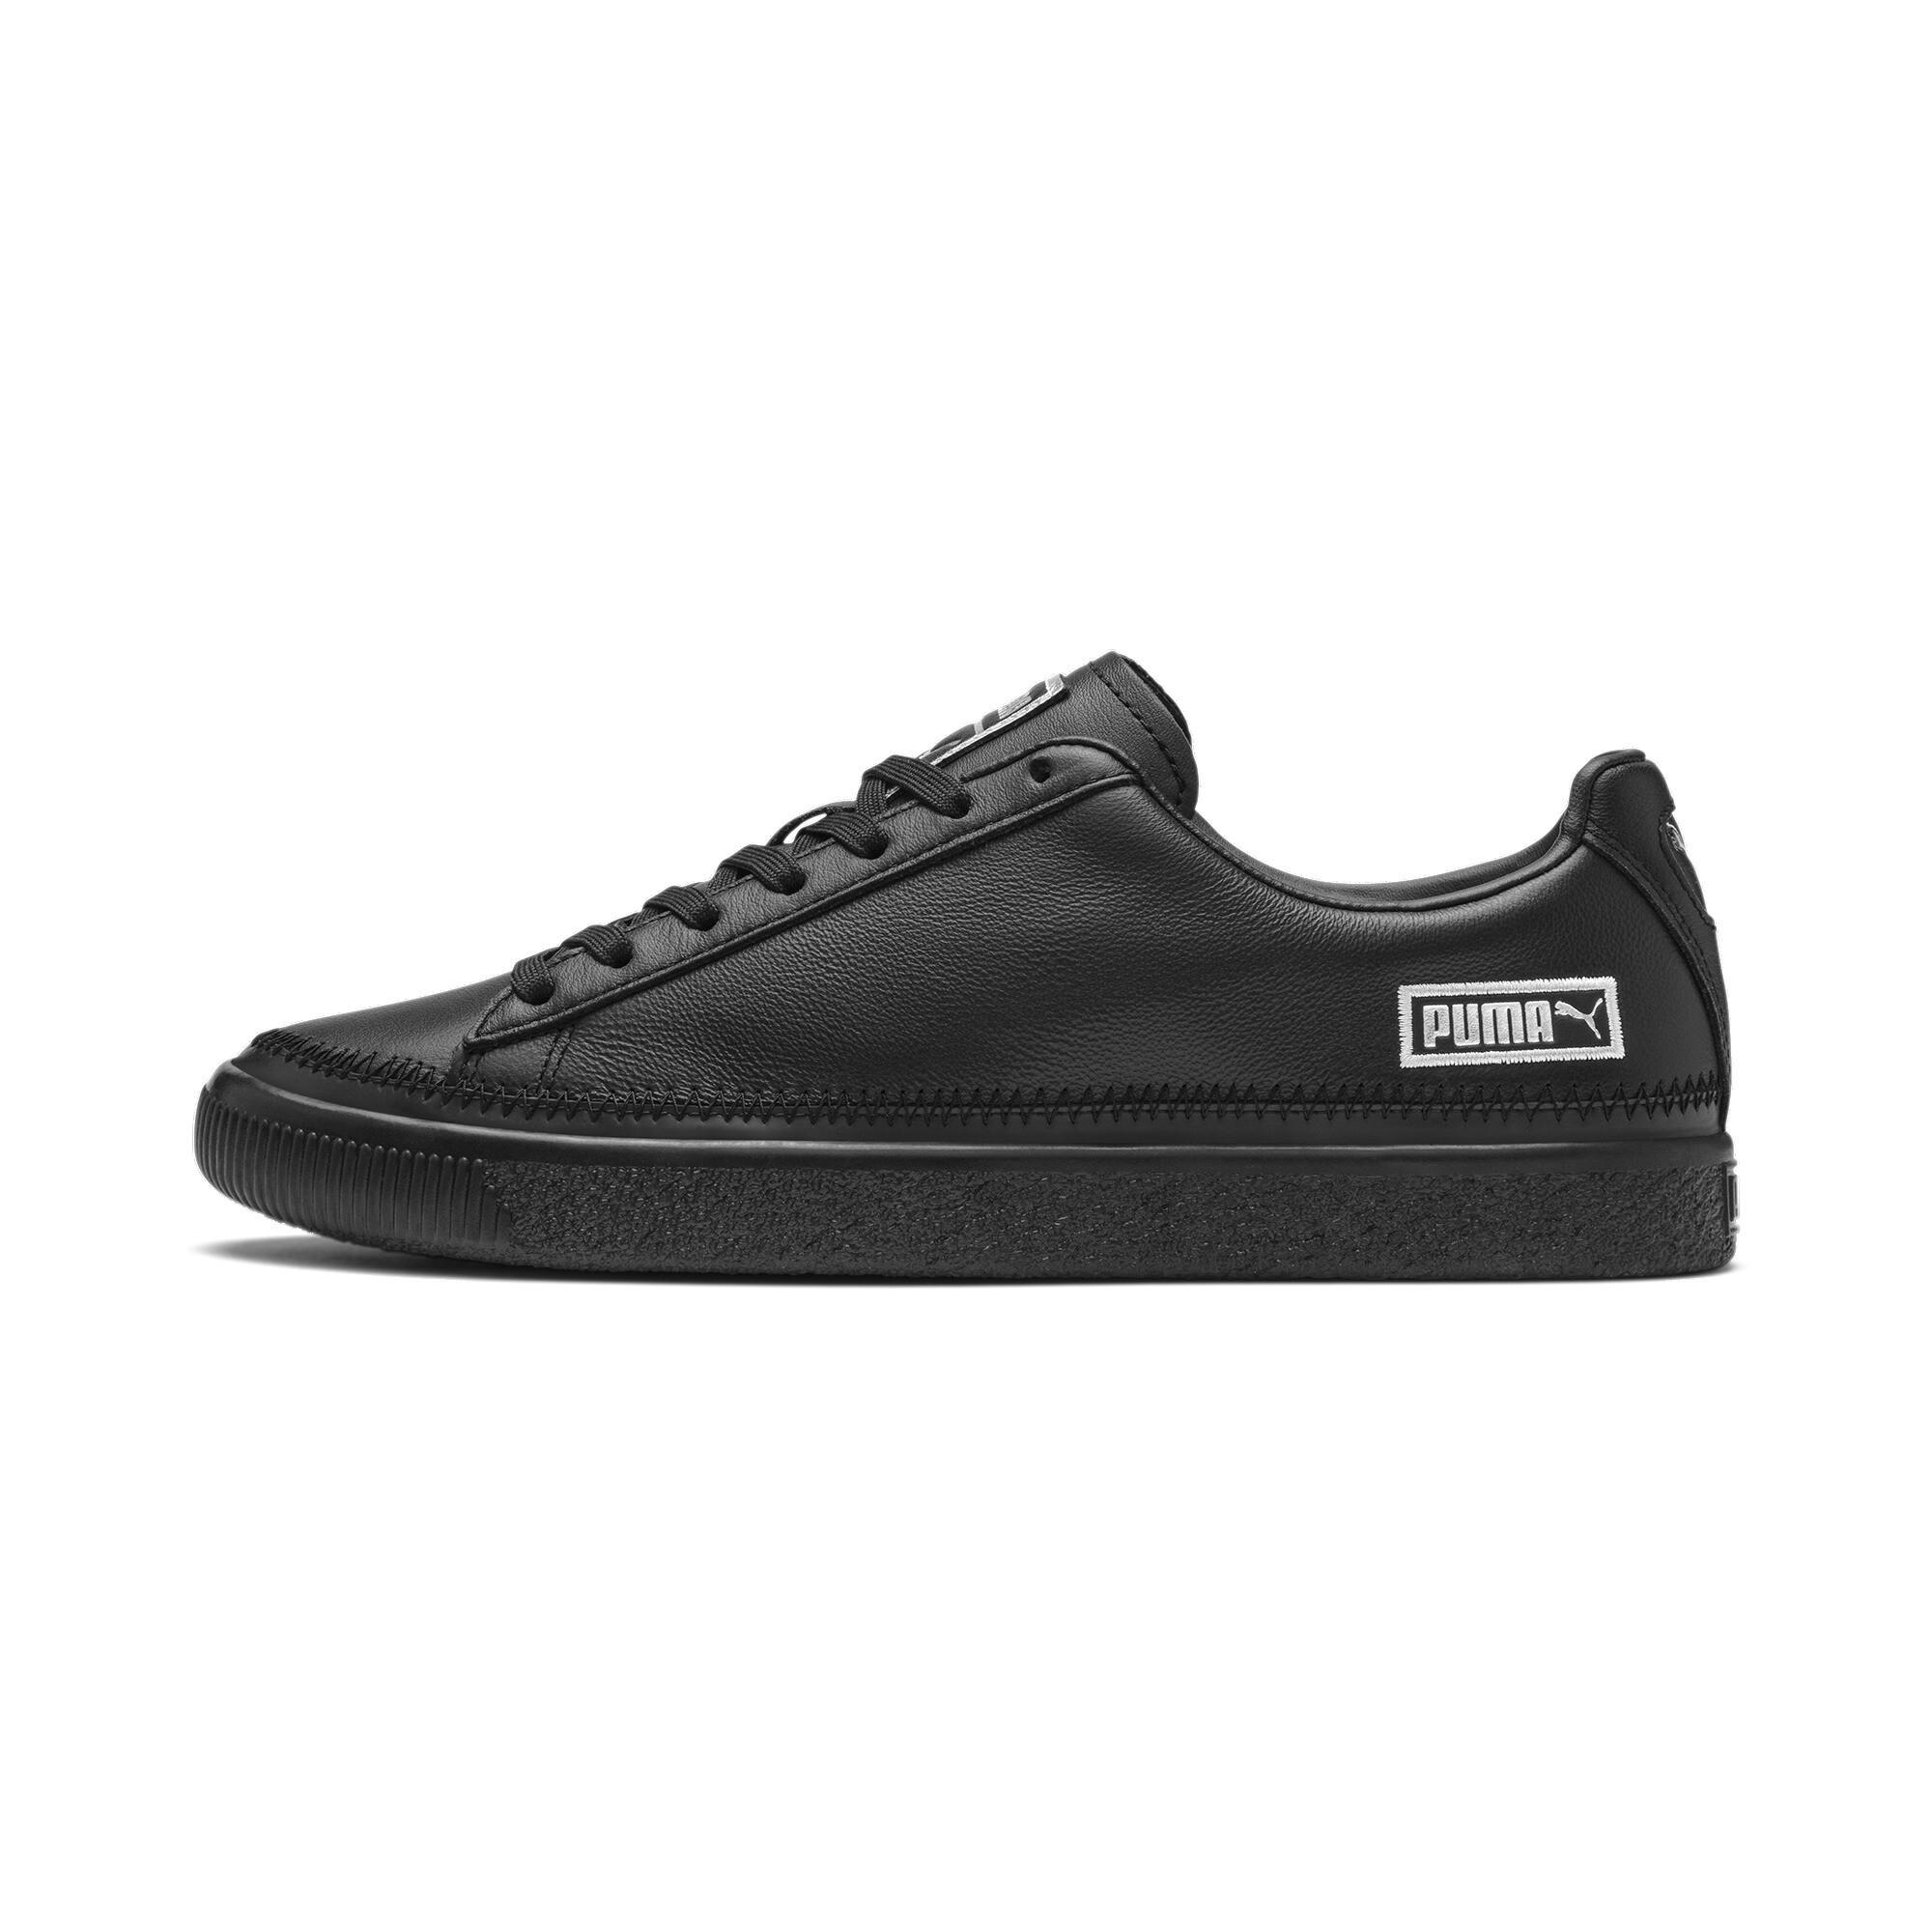 PUMA-Basket-Stitch-Sneaker-Unisex-Schuhe-Neu Indexbild 10